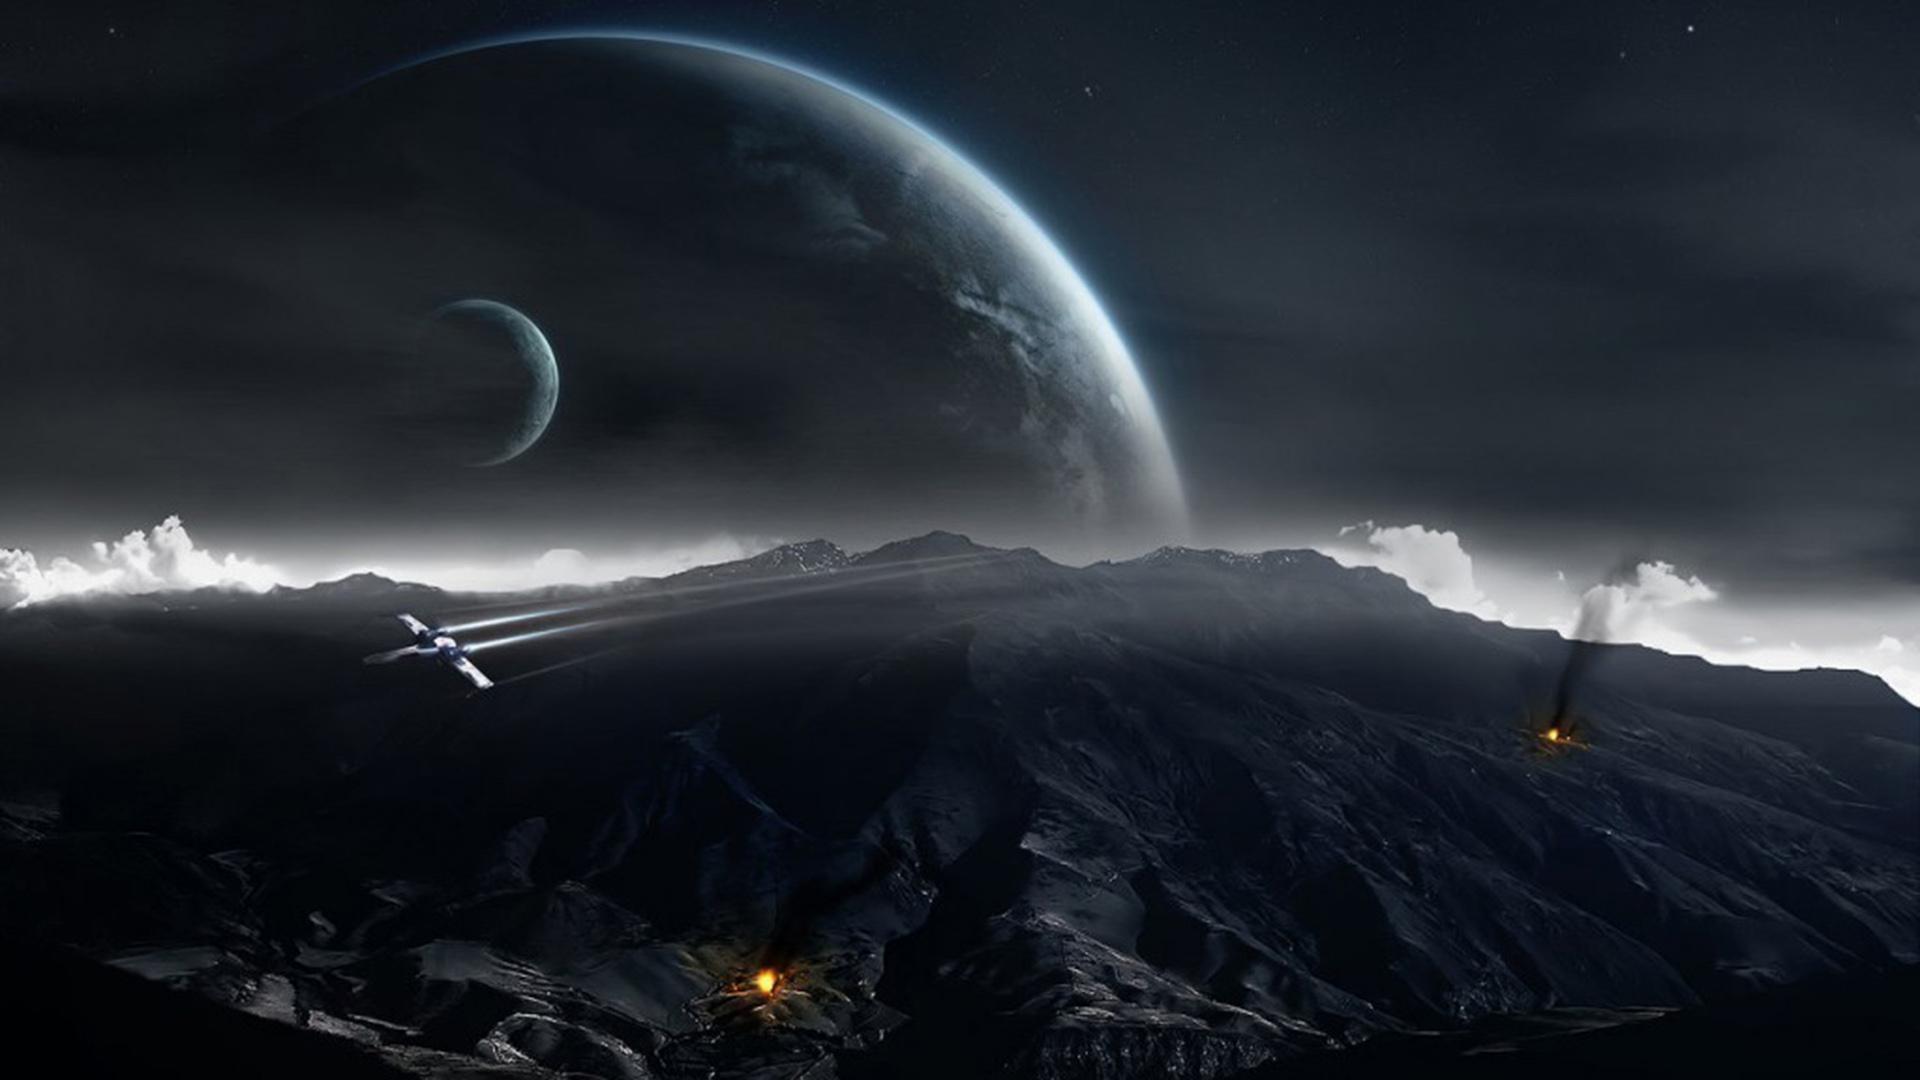 Space-art-wallpaper-nasa-images